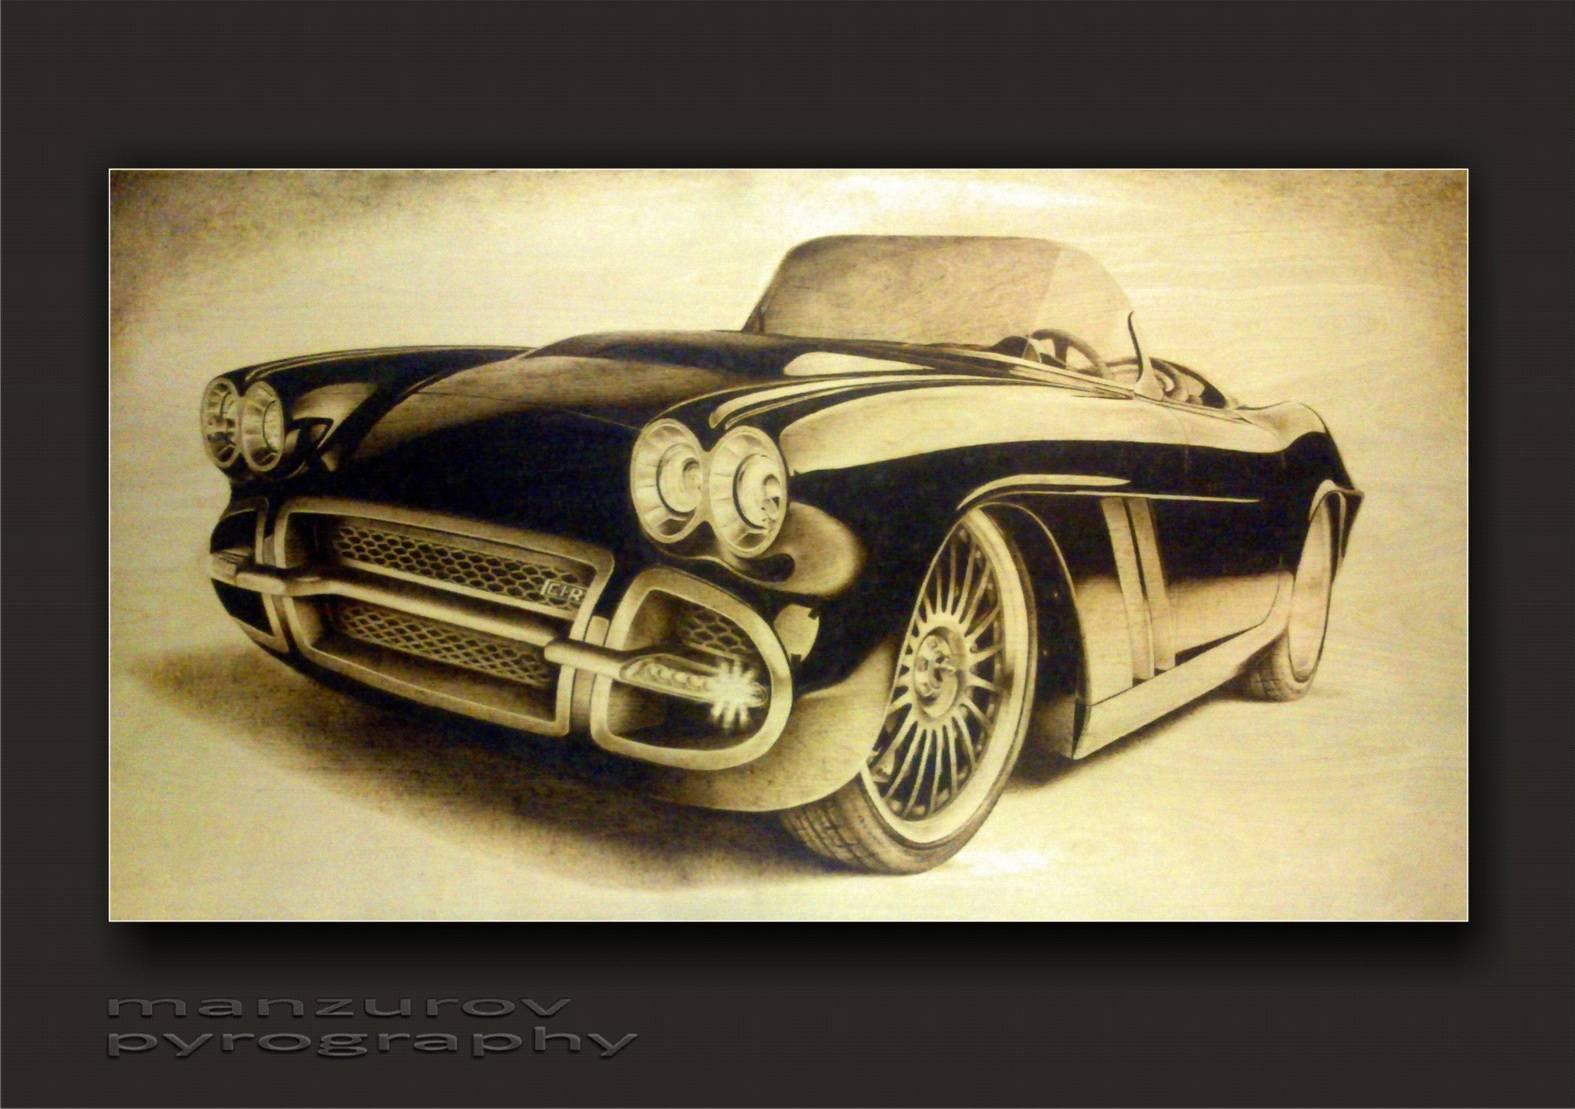 Corvette. Пирография, березовая фанера, матовый лак. Размер 55х100см